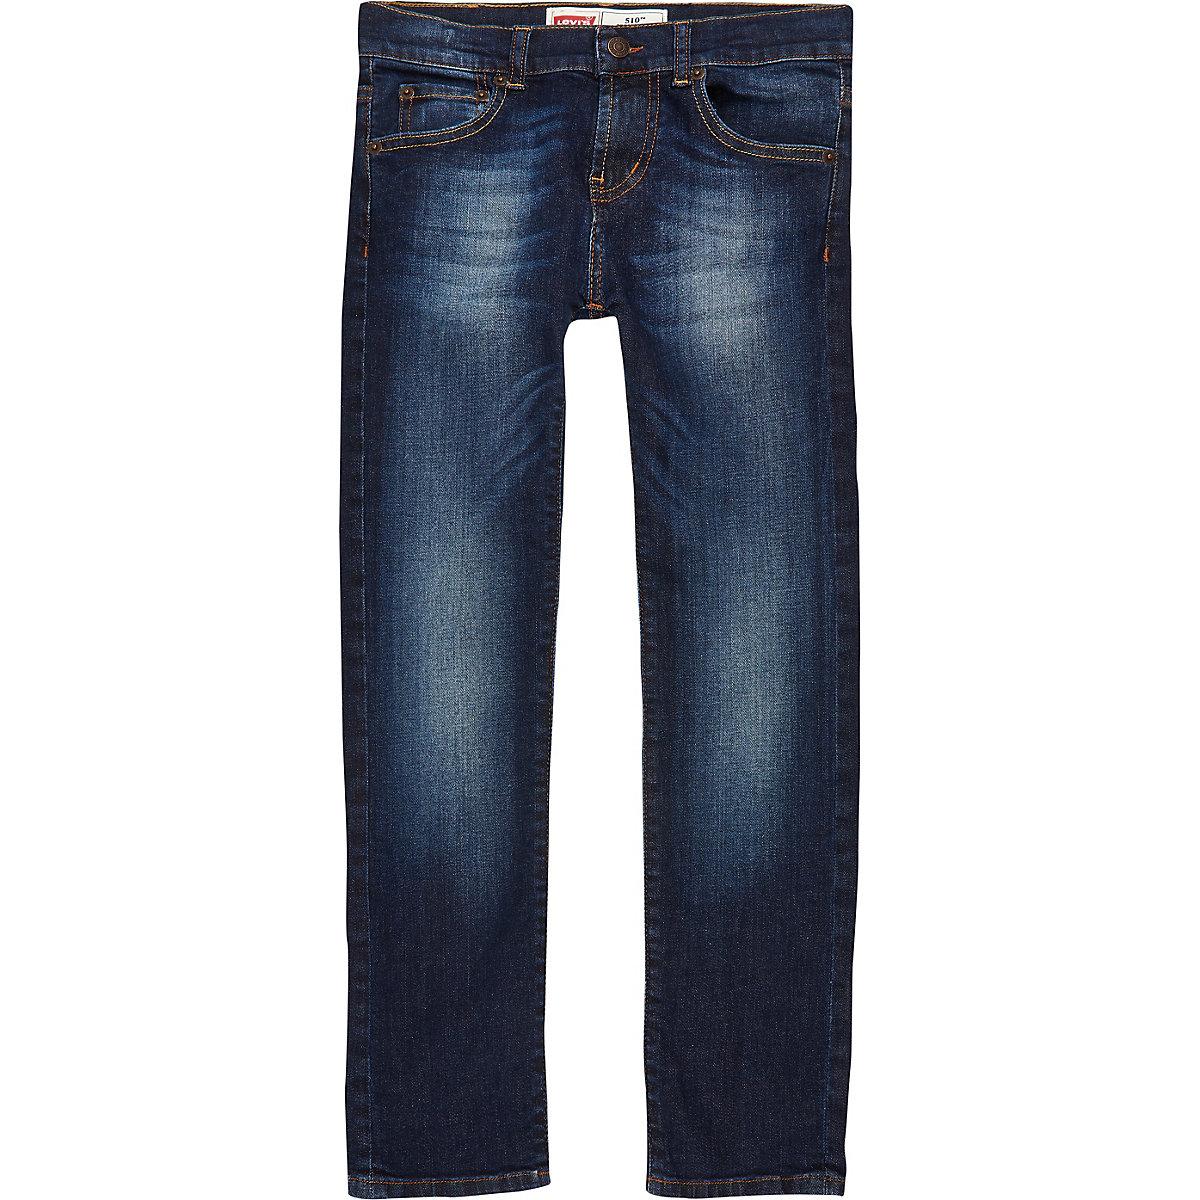 Boys dark blue Levi's skinny fit jeans